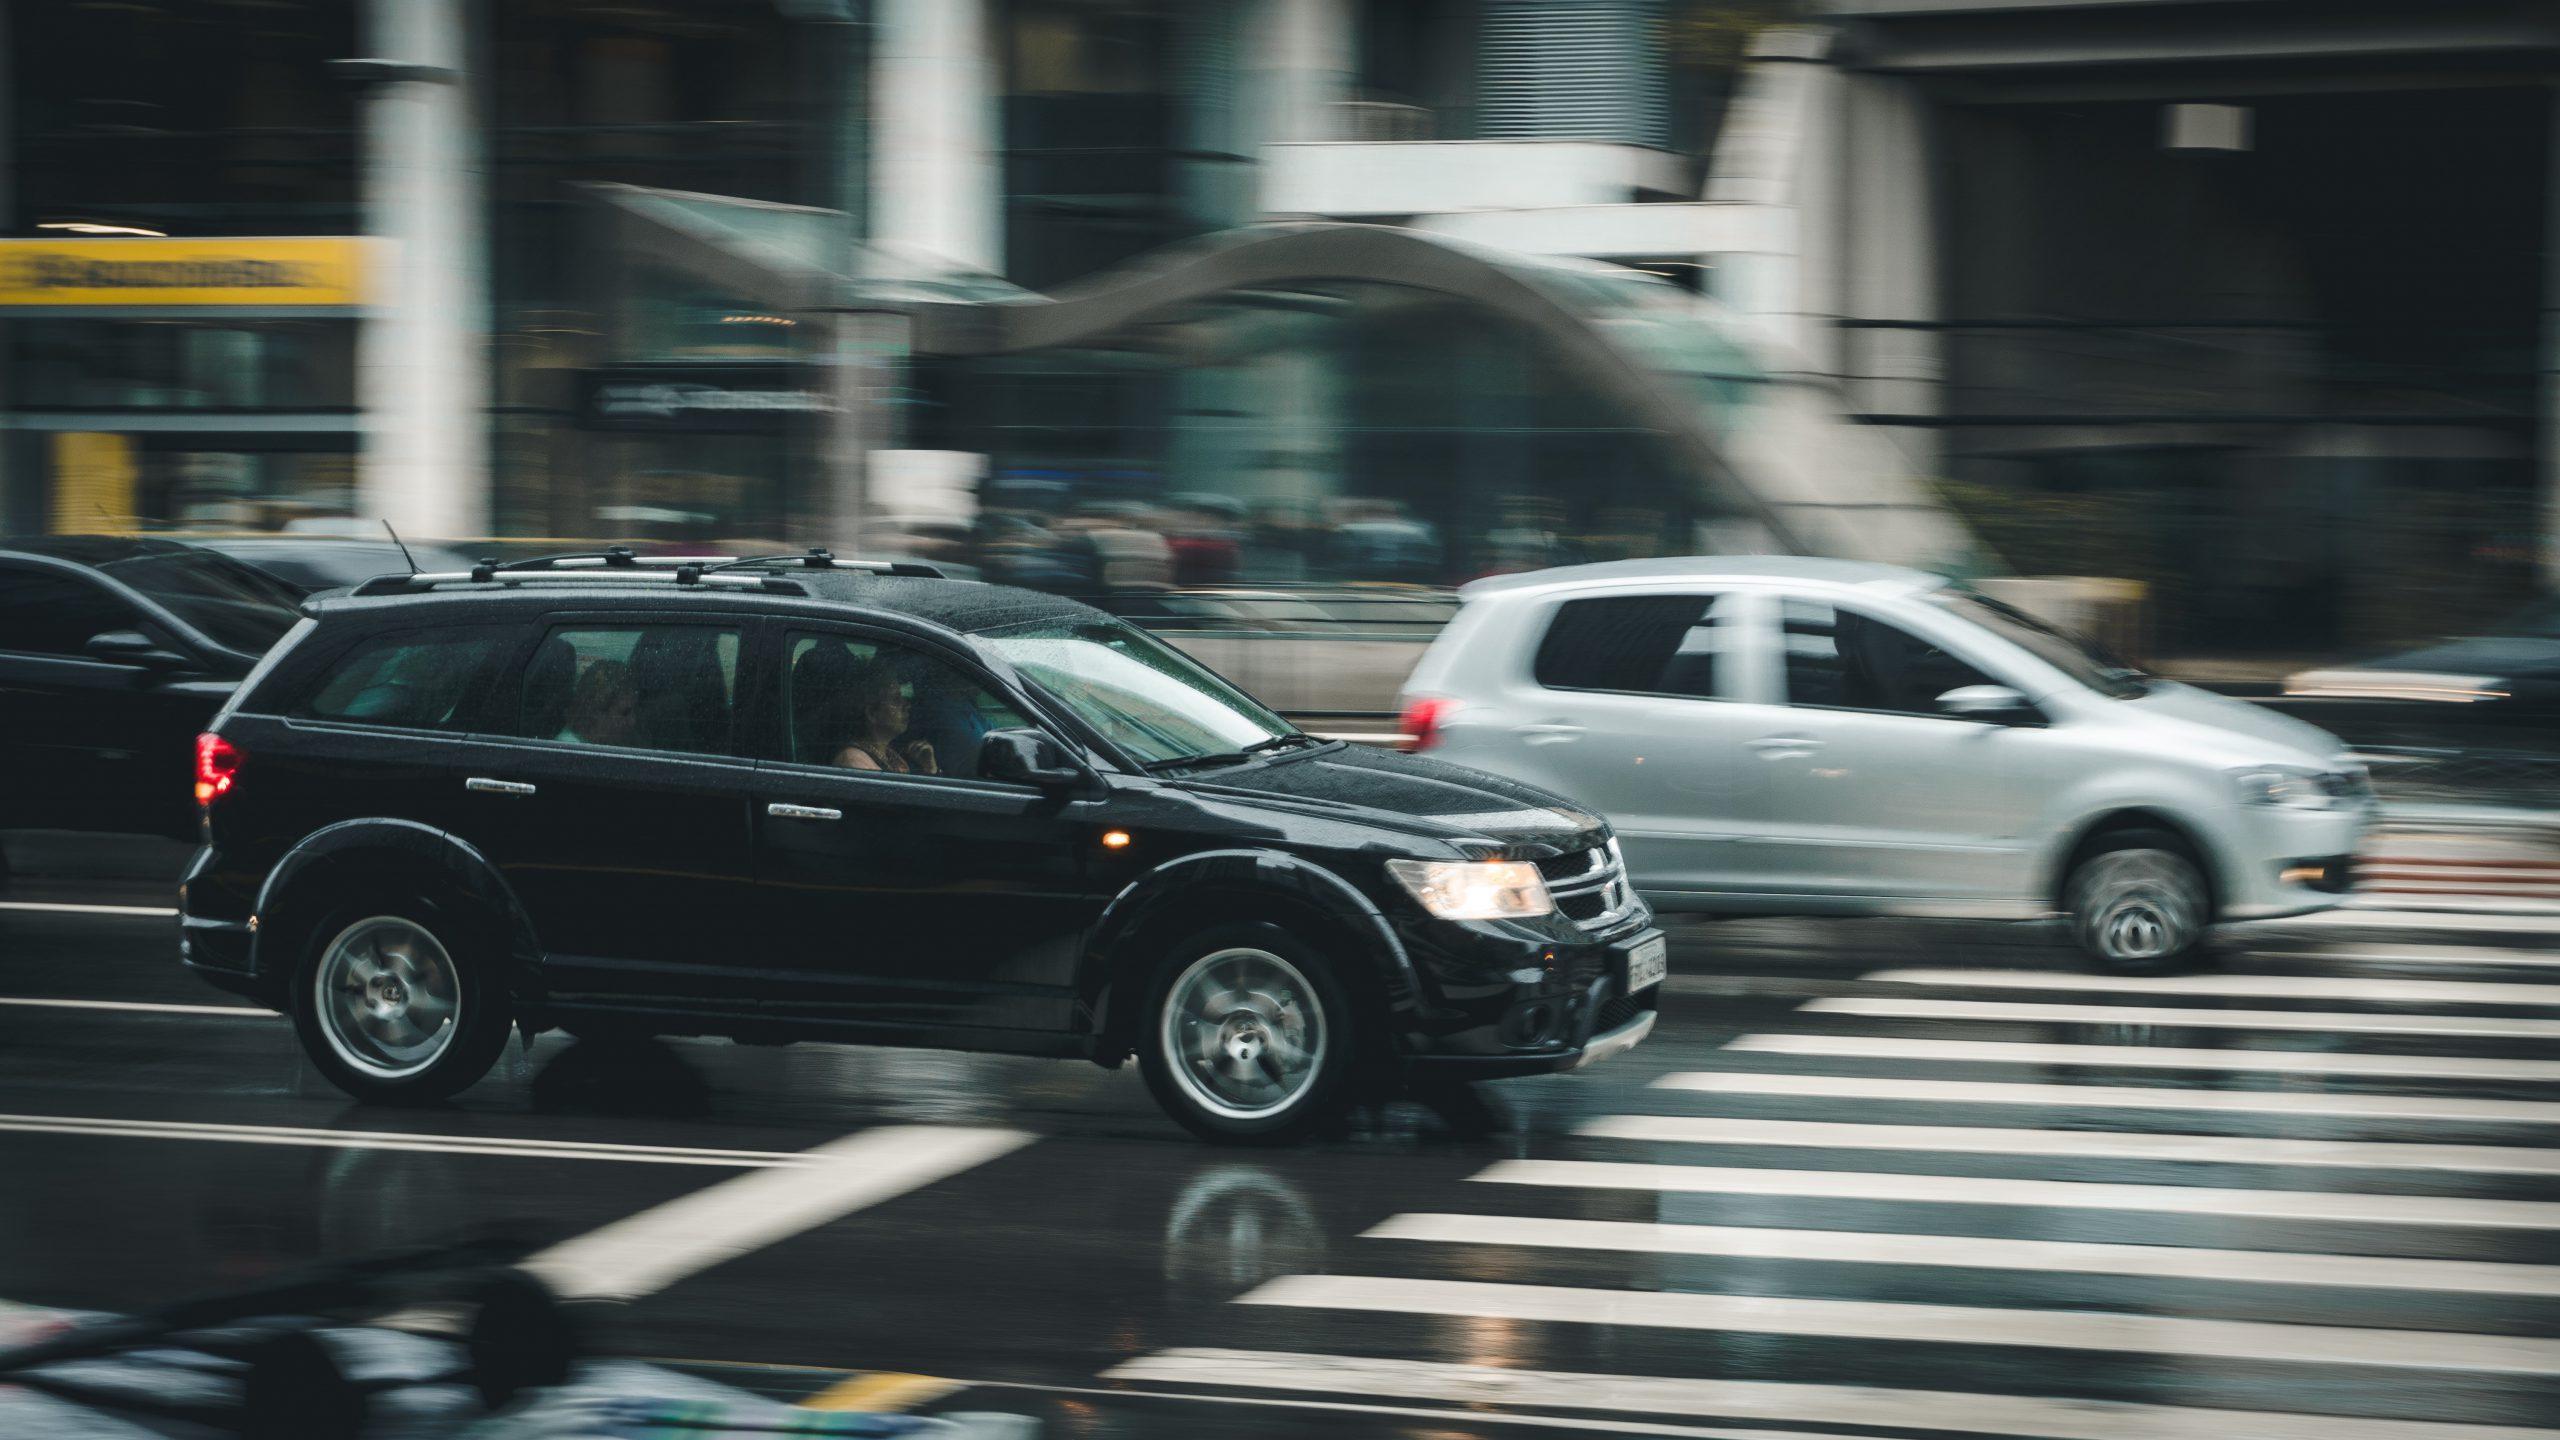 Dallas Pedestrian Accident Lawyer